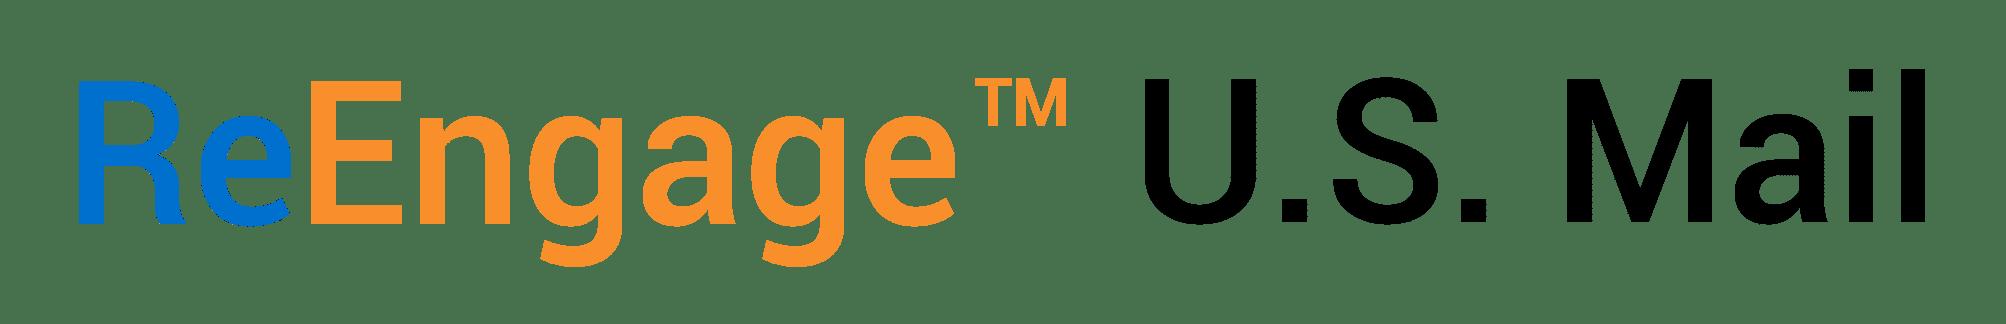 ReEngage™ U.S. Mail